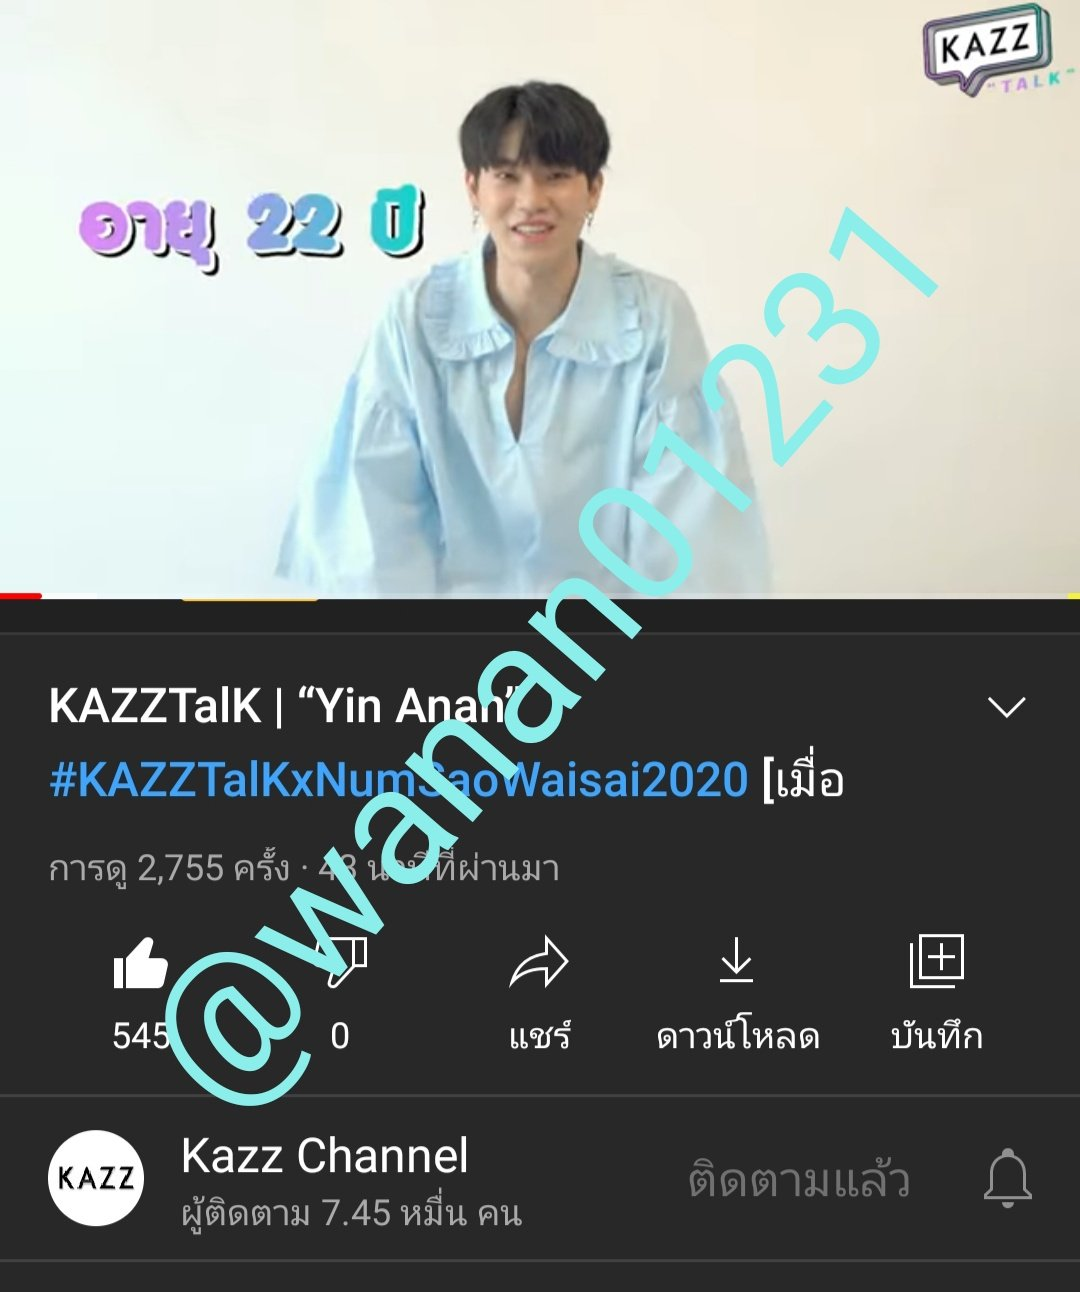 #KAZZTalKxNumSaoWaiSai2020 ภาพถ่าย,#KAZZTalKxNumSaoWaiSai2020 แนวโน้มของ Twitter - ทวีตด้านบน